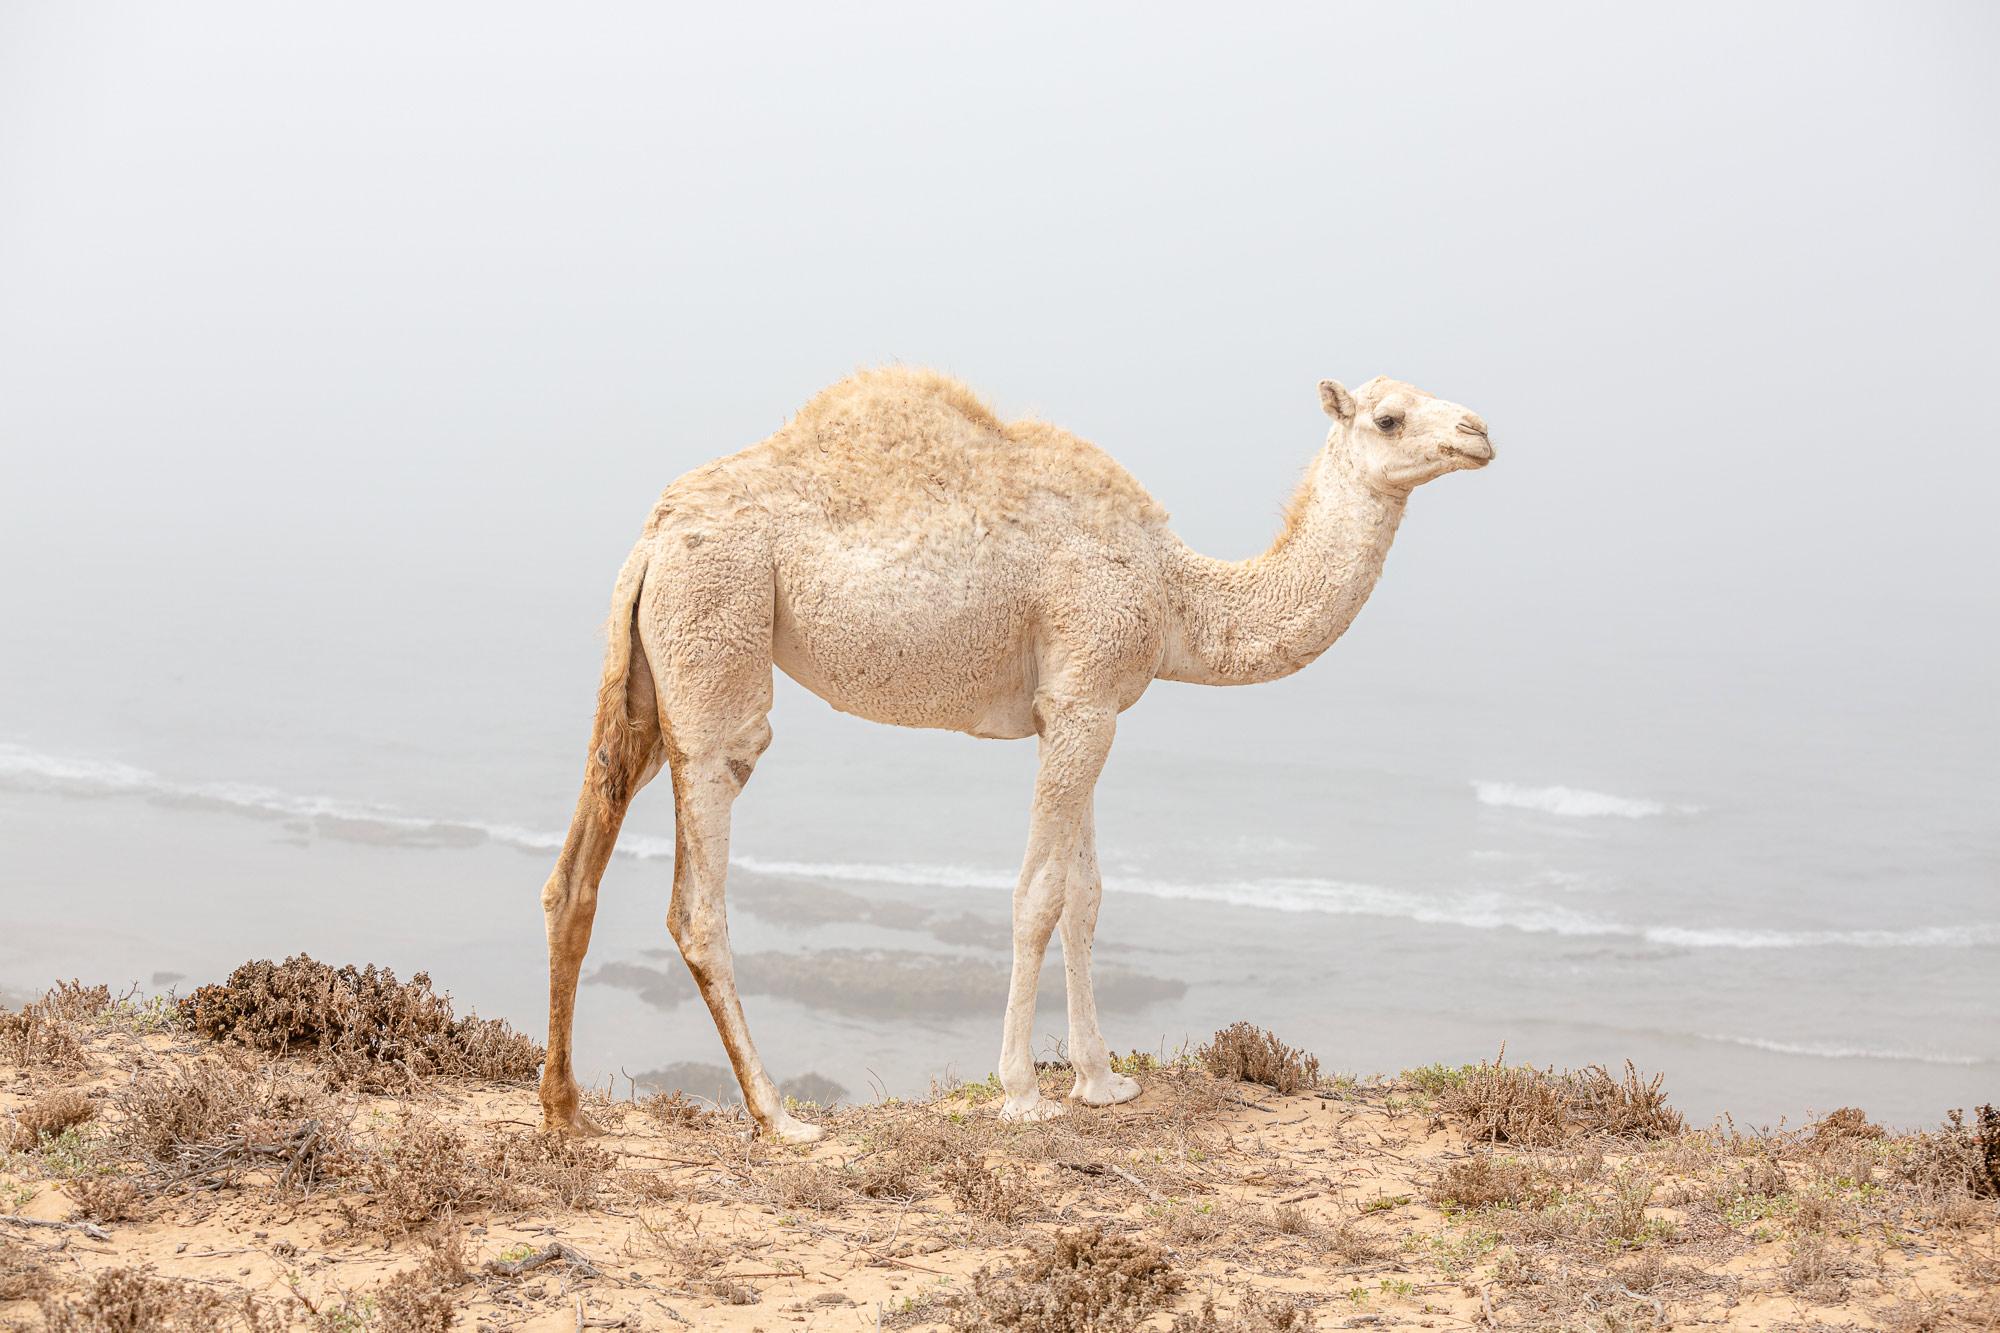 Trek au Maroc Agadir Essaouira dromadaire